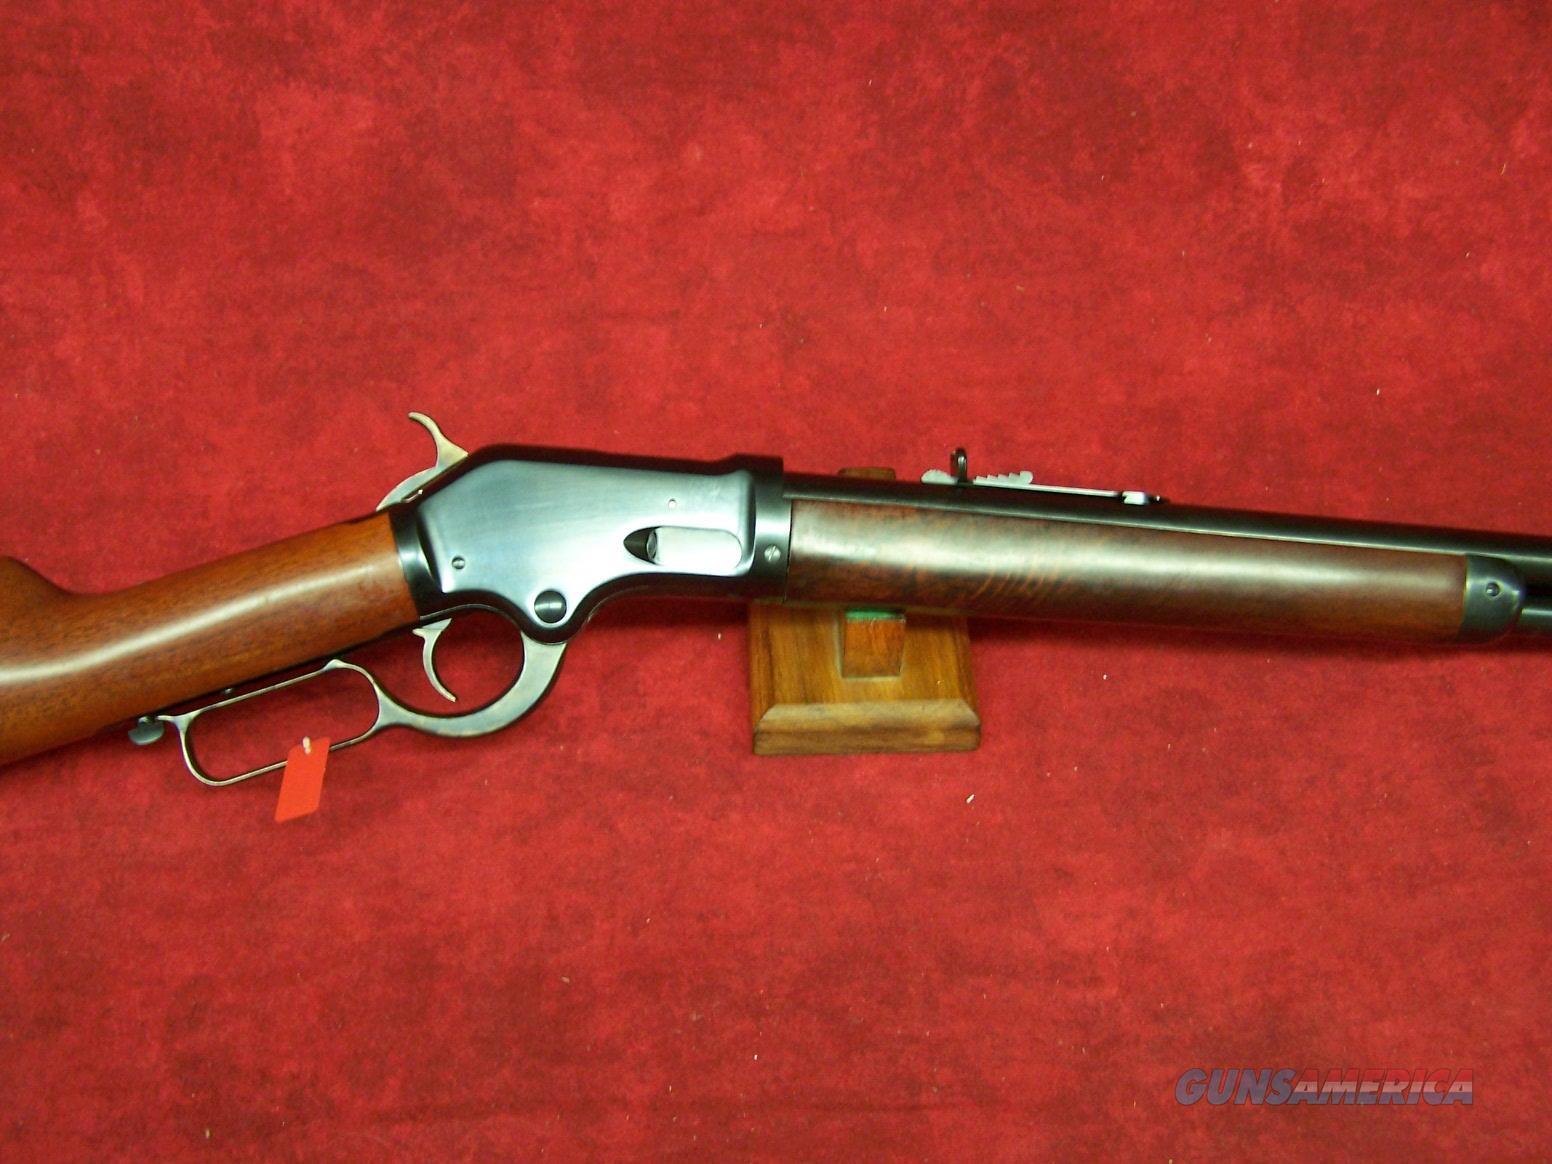 "Uberti 1883 Lever Action Rifle 45 Colt 25.5"" Barrel (342455)  Guns > Rifles > Uberti Rifles > Lever Action"